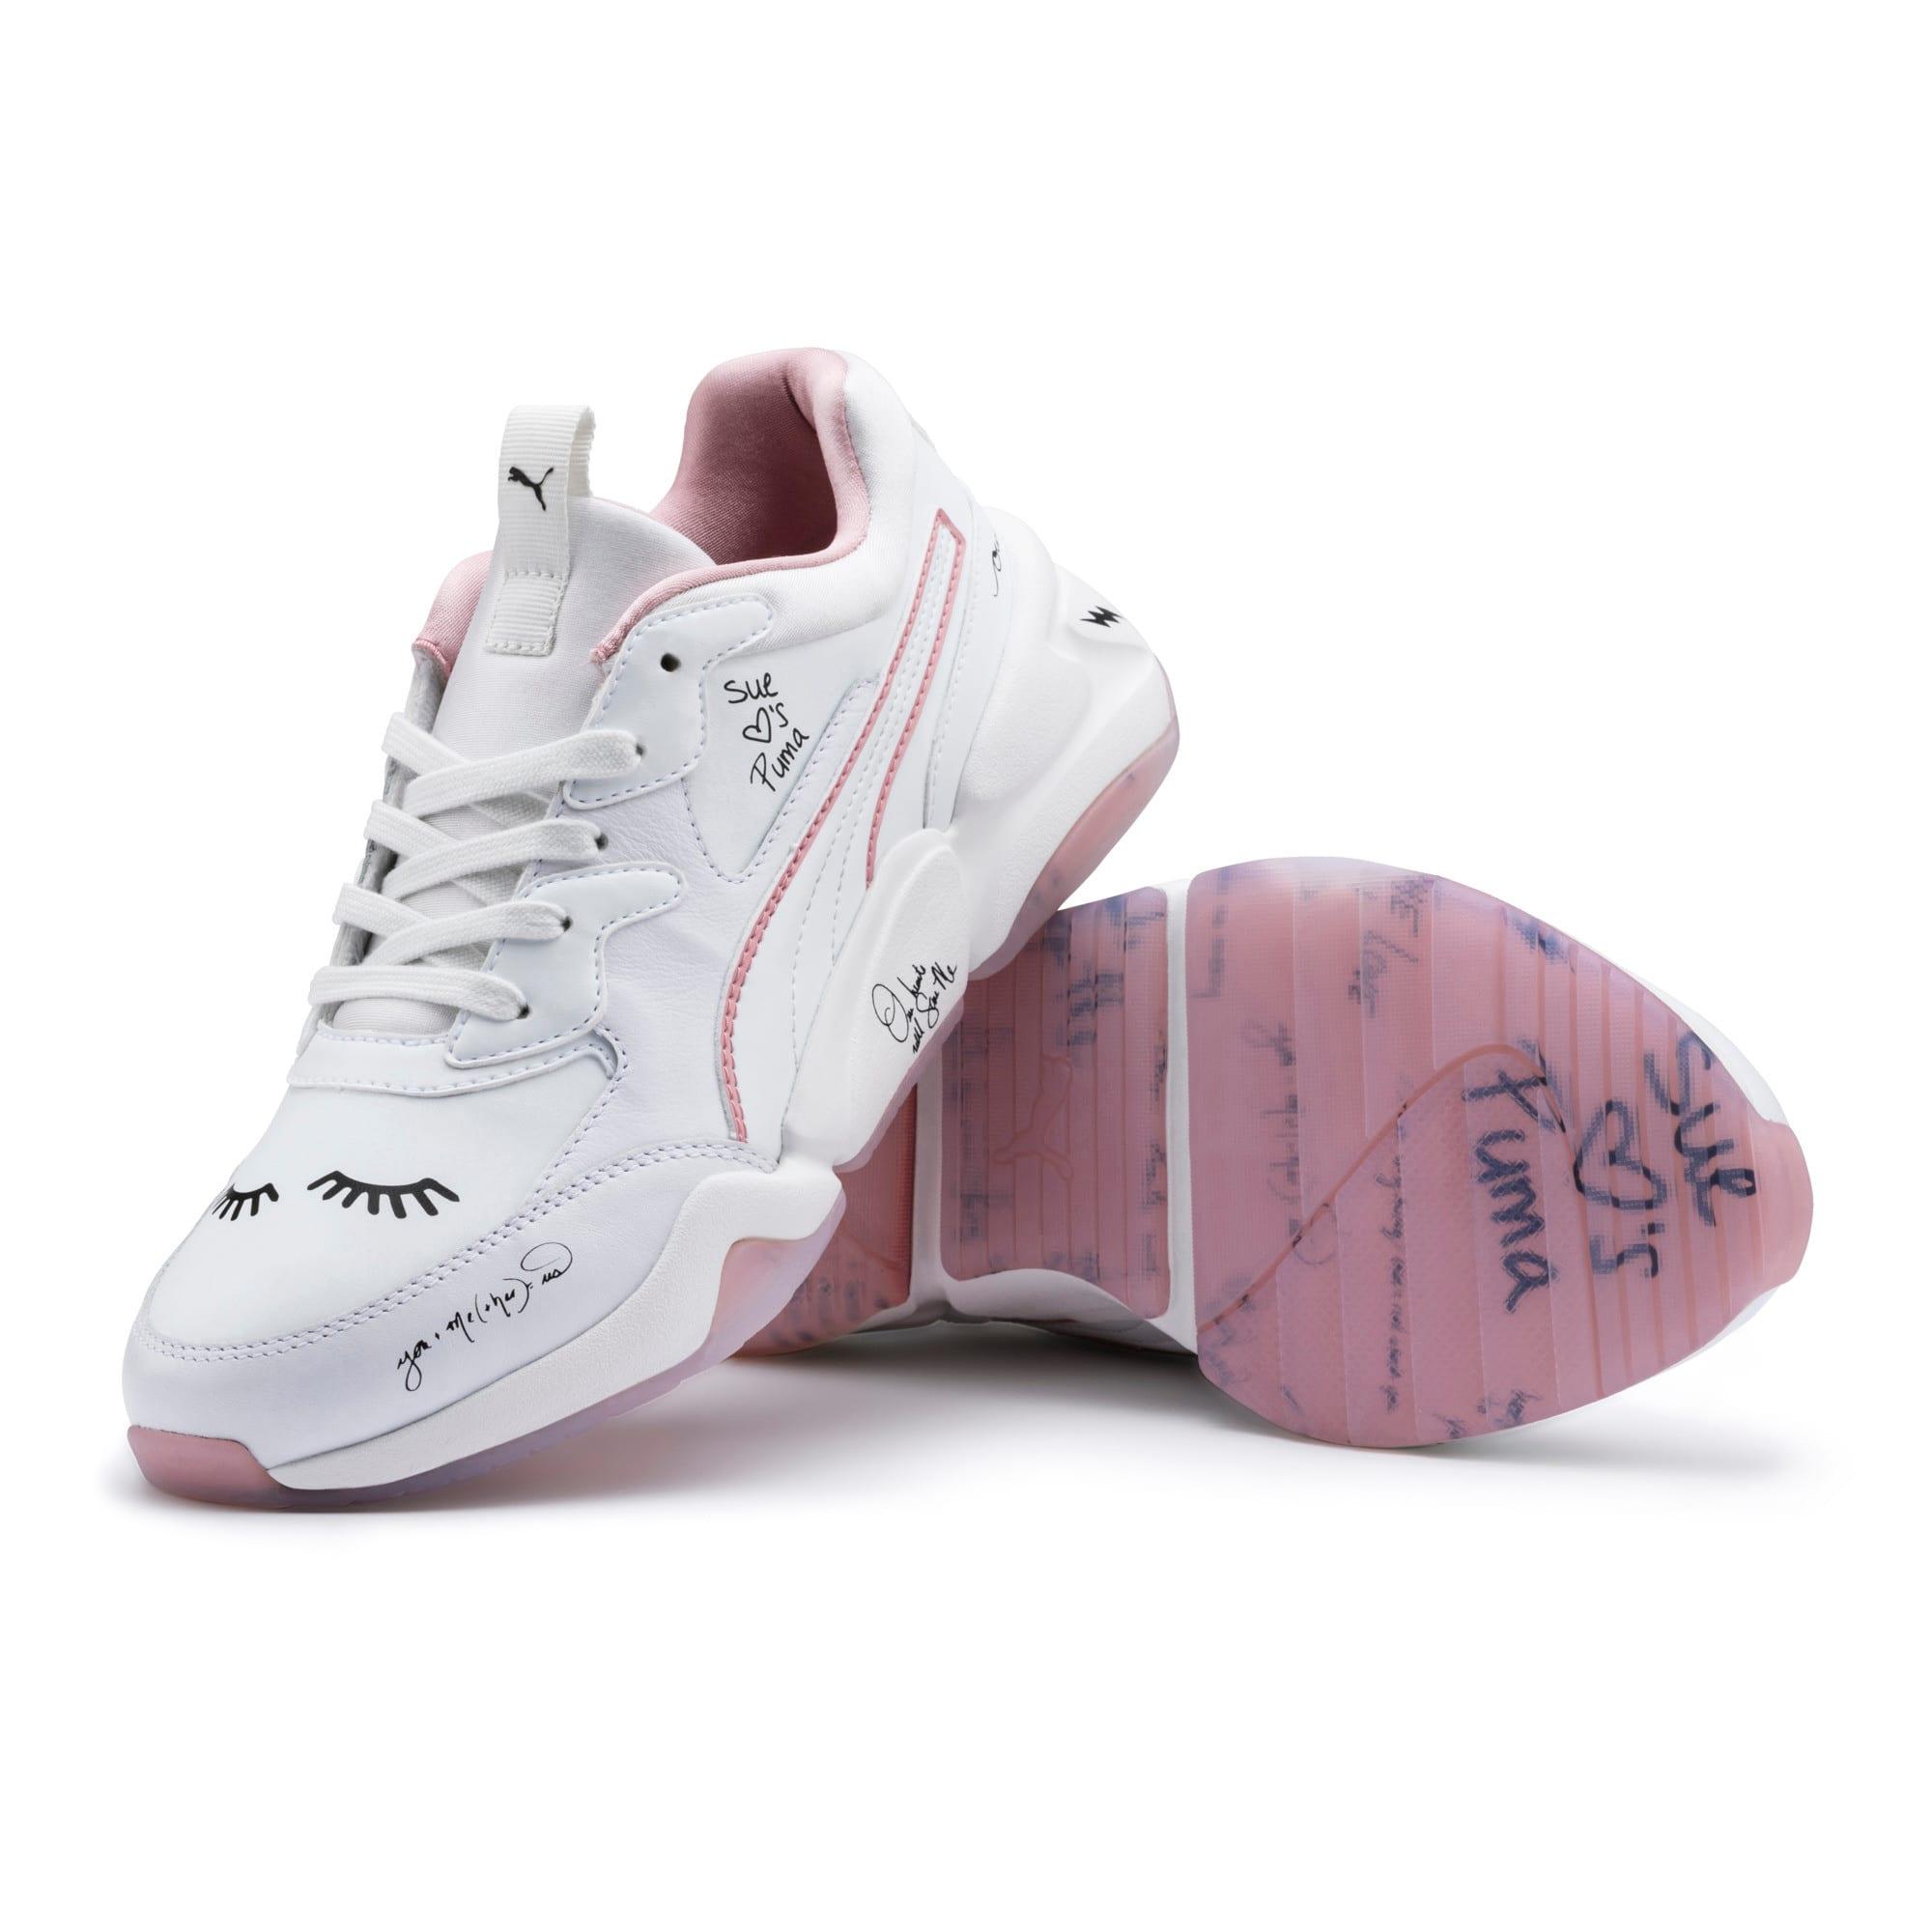 Thumbnail 10 of PUMA x SUE TSAI Nova Women's Sneakers, Bright White-Bright White, medium